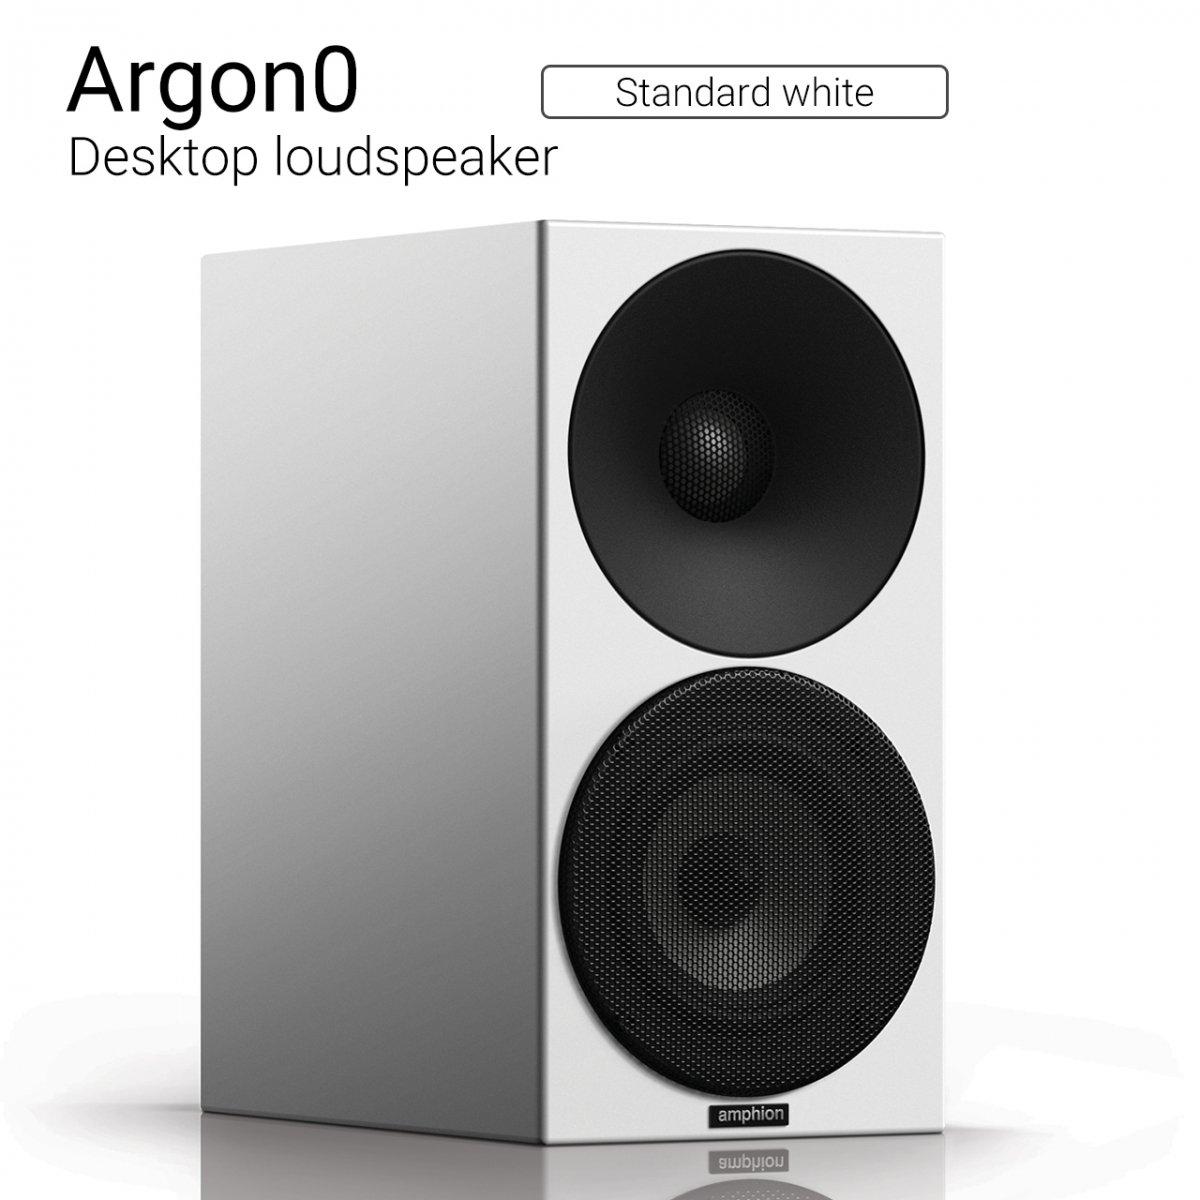 Amphion Argon0 Standard white